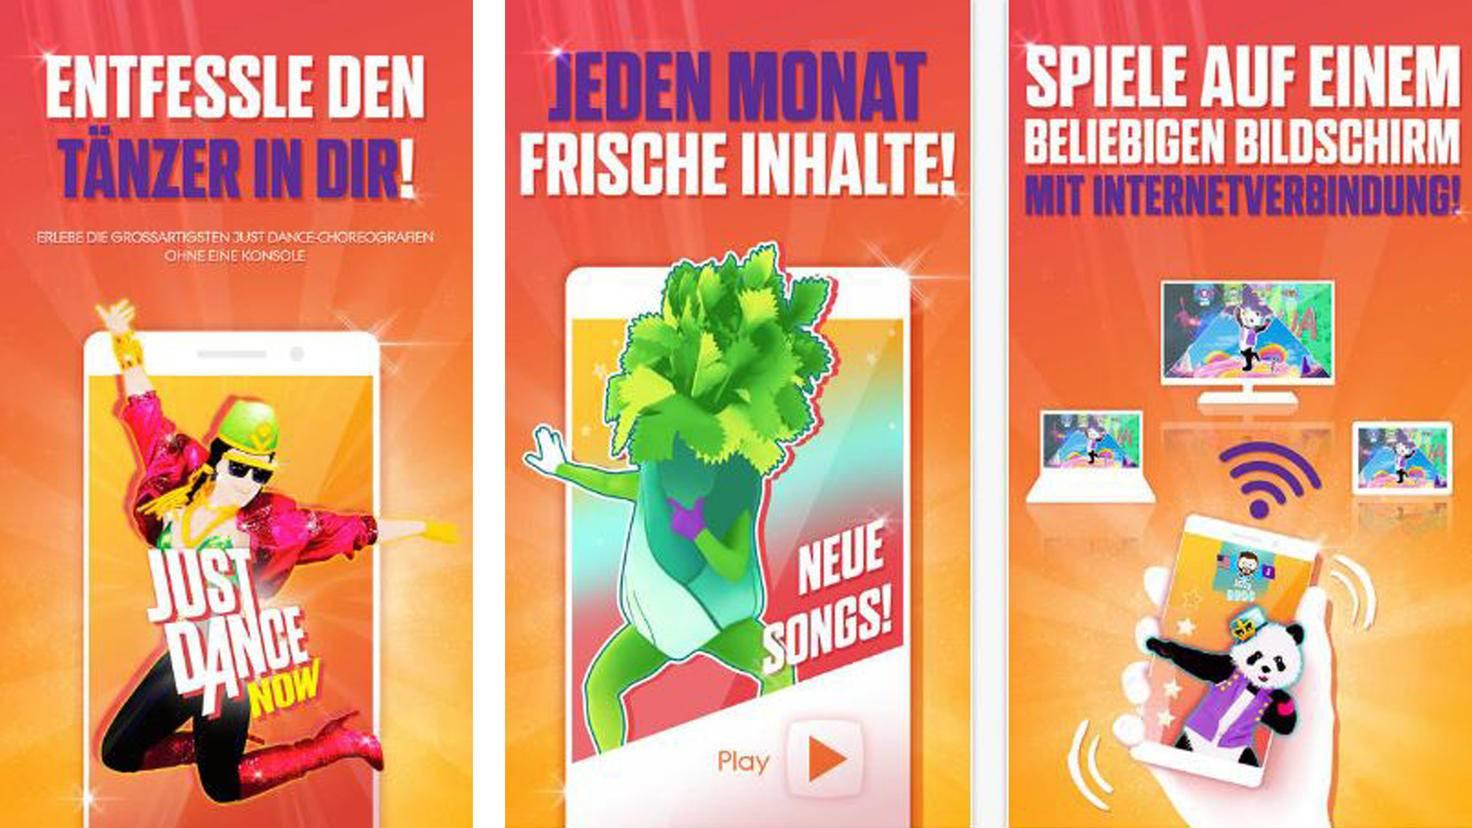 Just Dance Now-iTunes-Ubisoft Entertainment